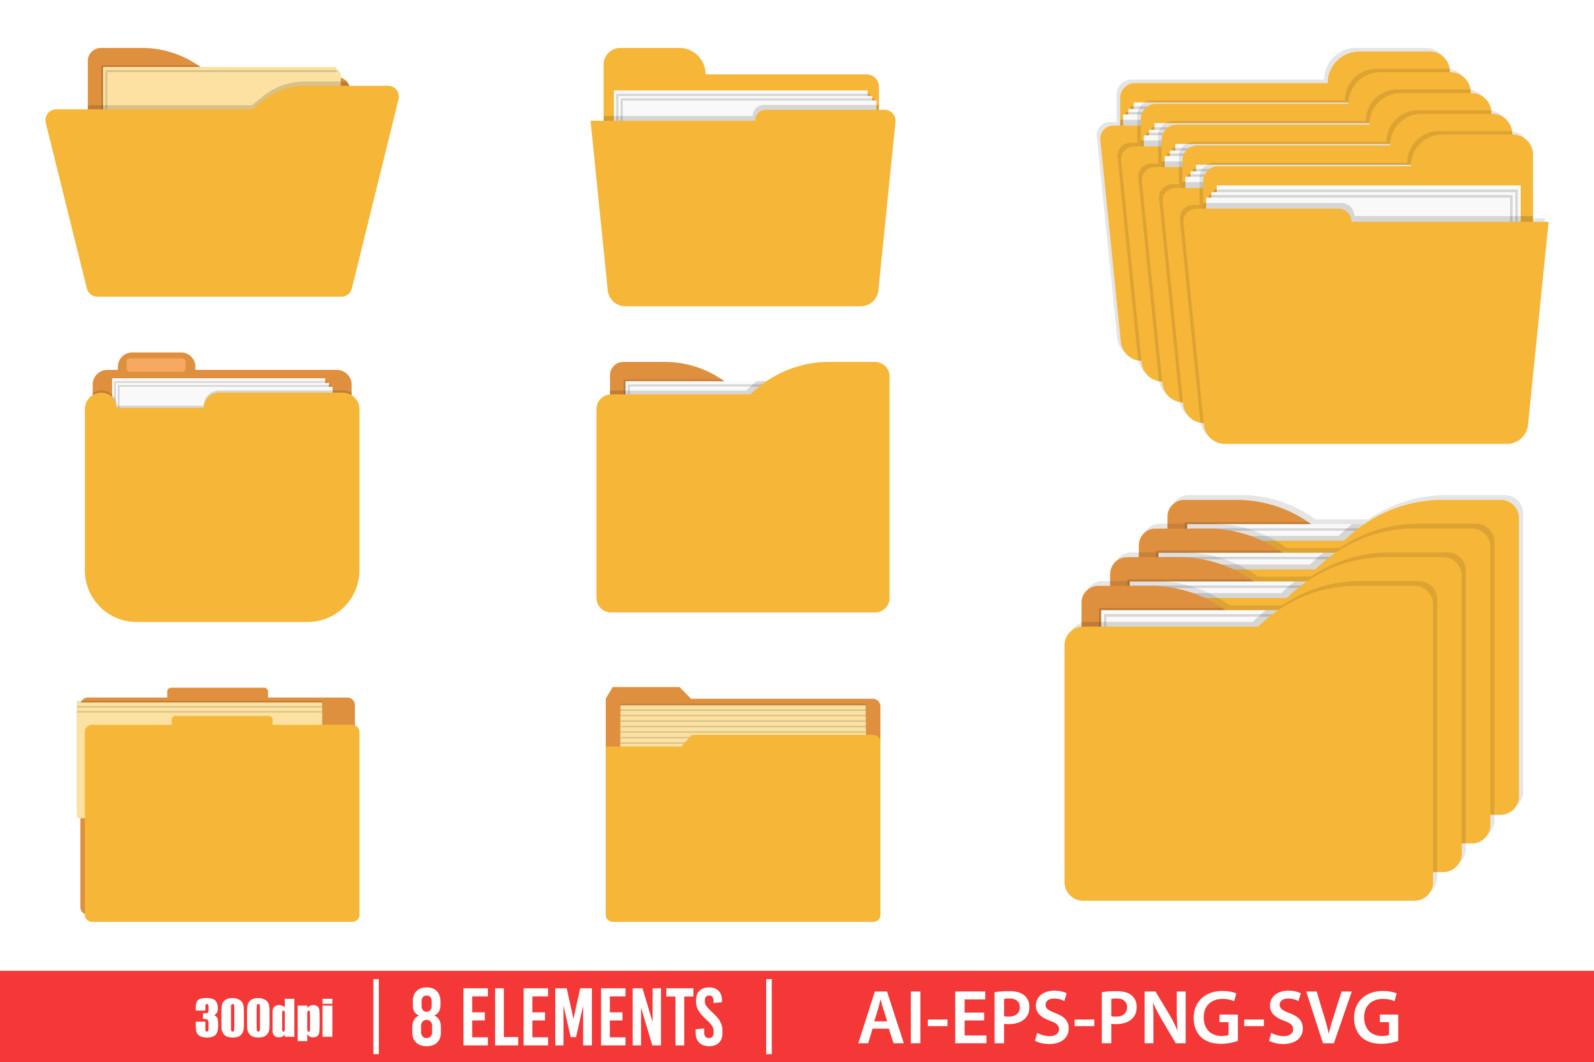 Folder icon clipart vector design illustration. Folder icon set. Vector Clipart Print - FOLDER scaled -